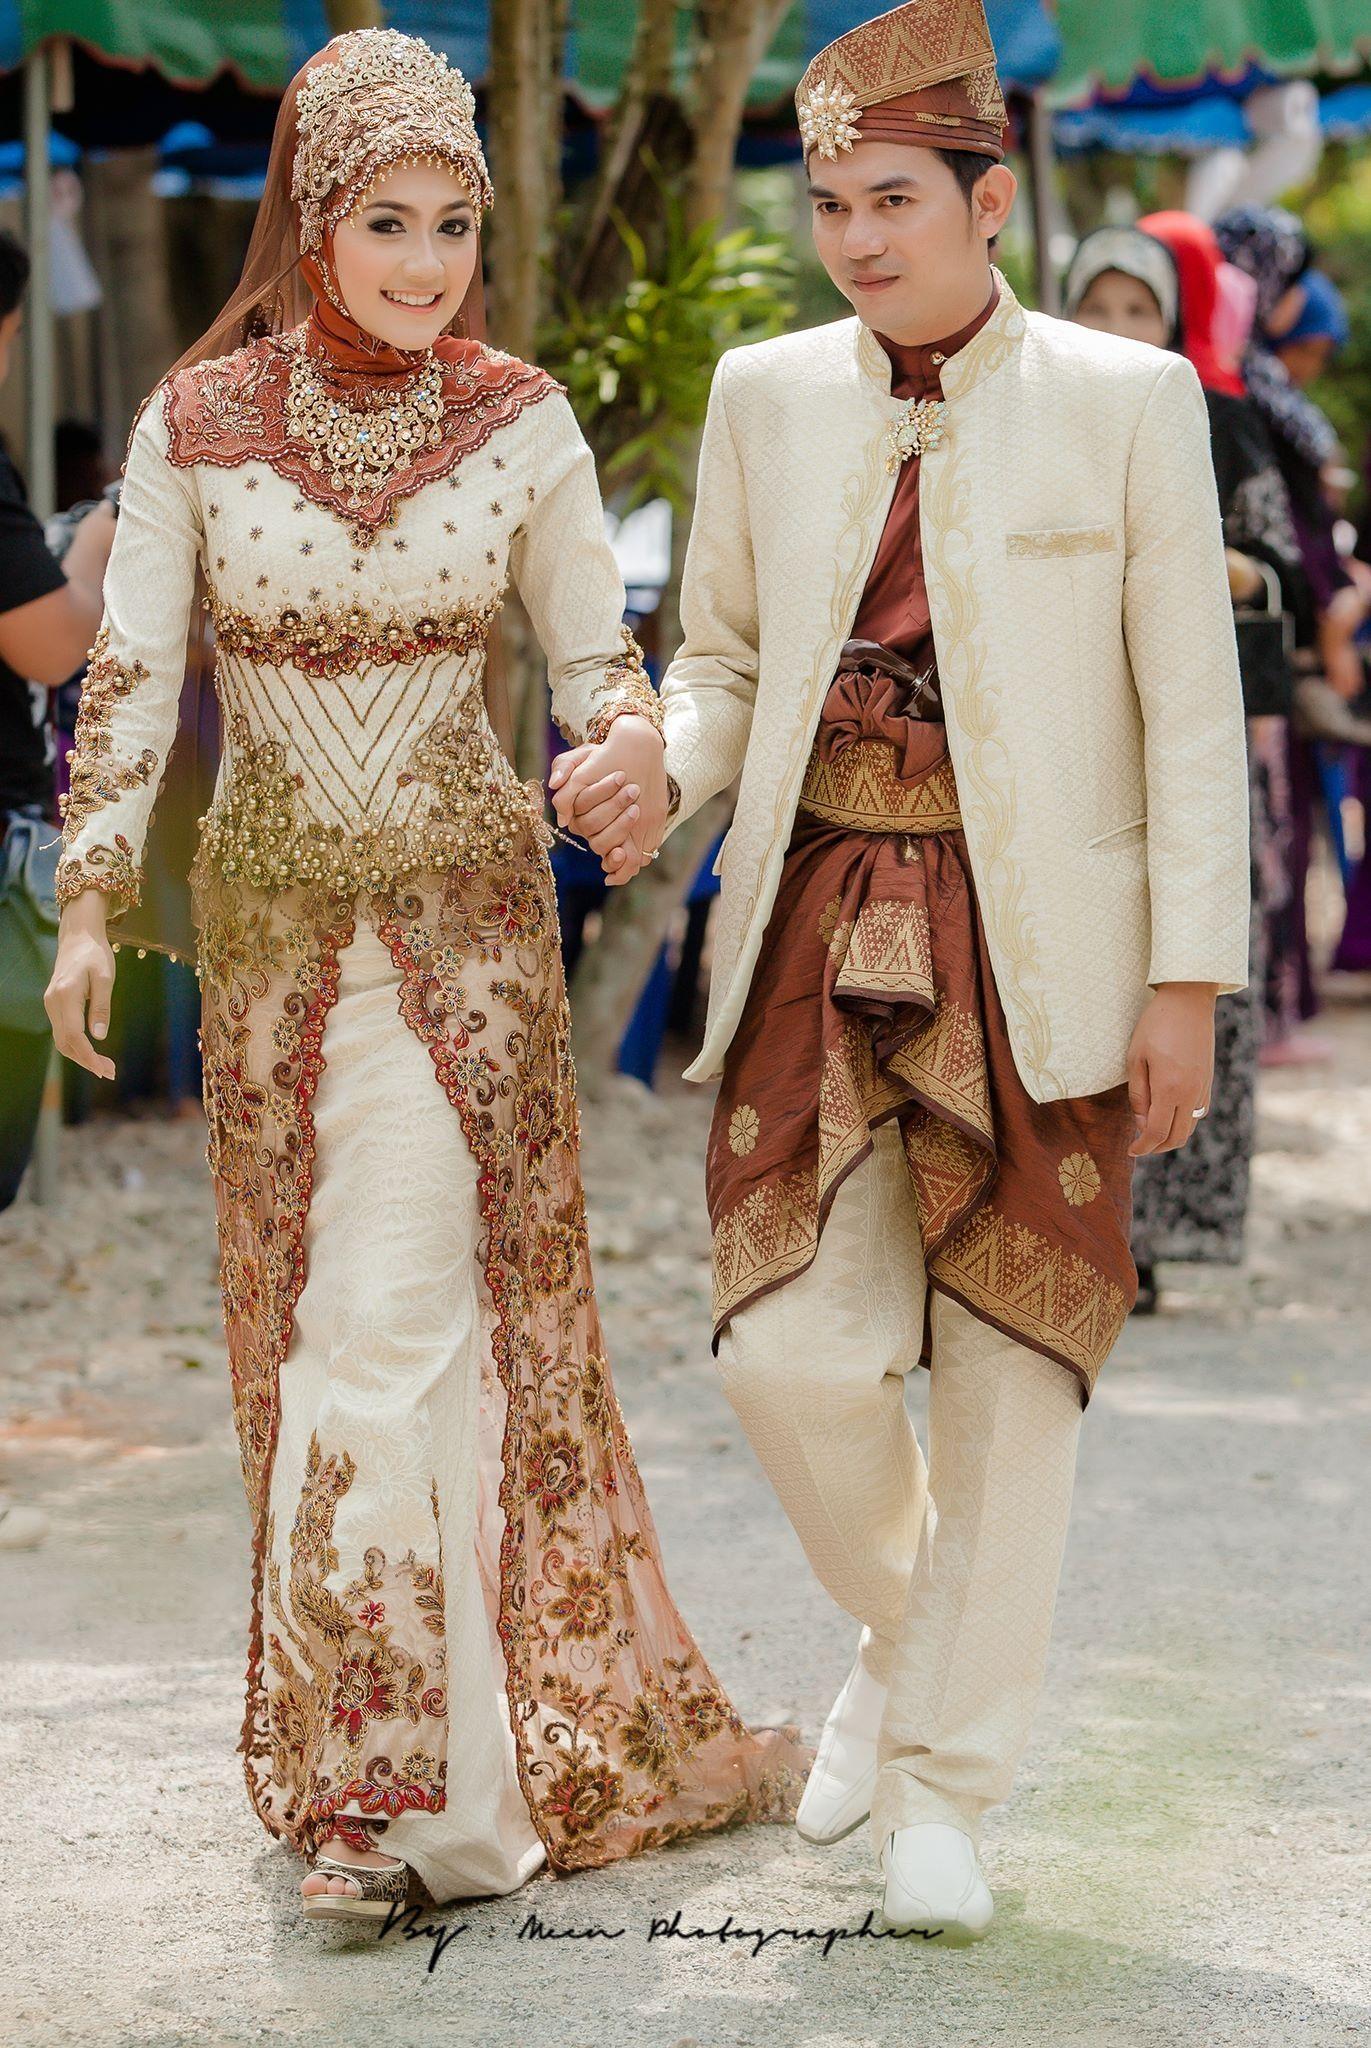 Muslim Couple Follow me here MrZeshan Sadiq